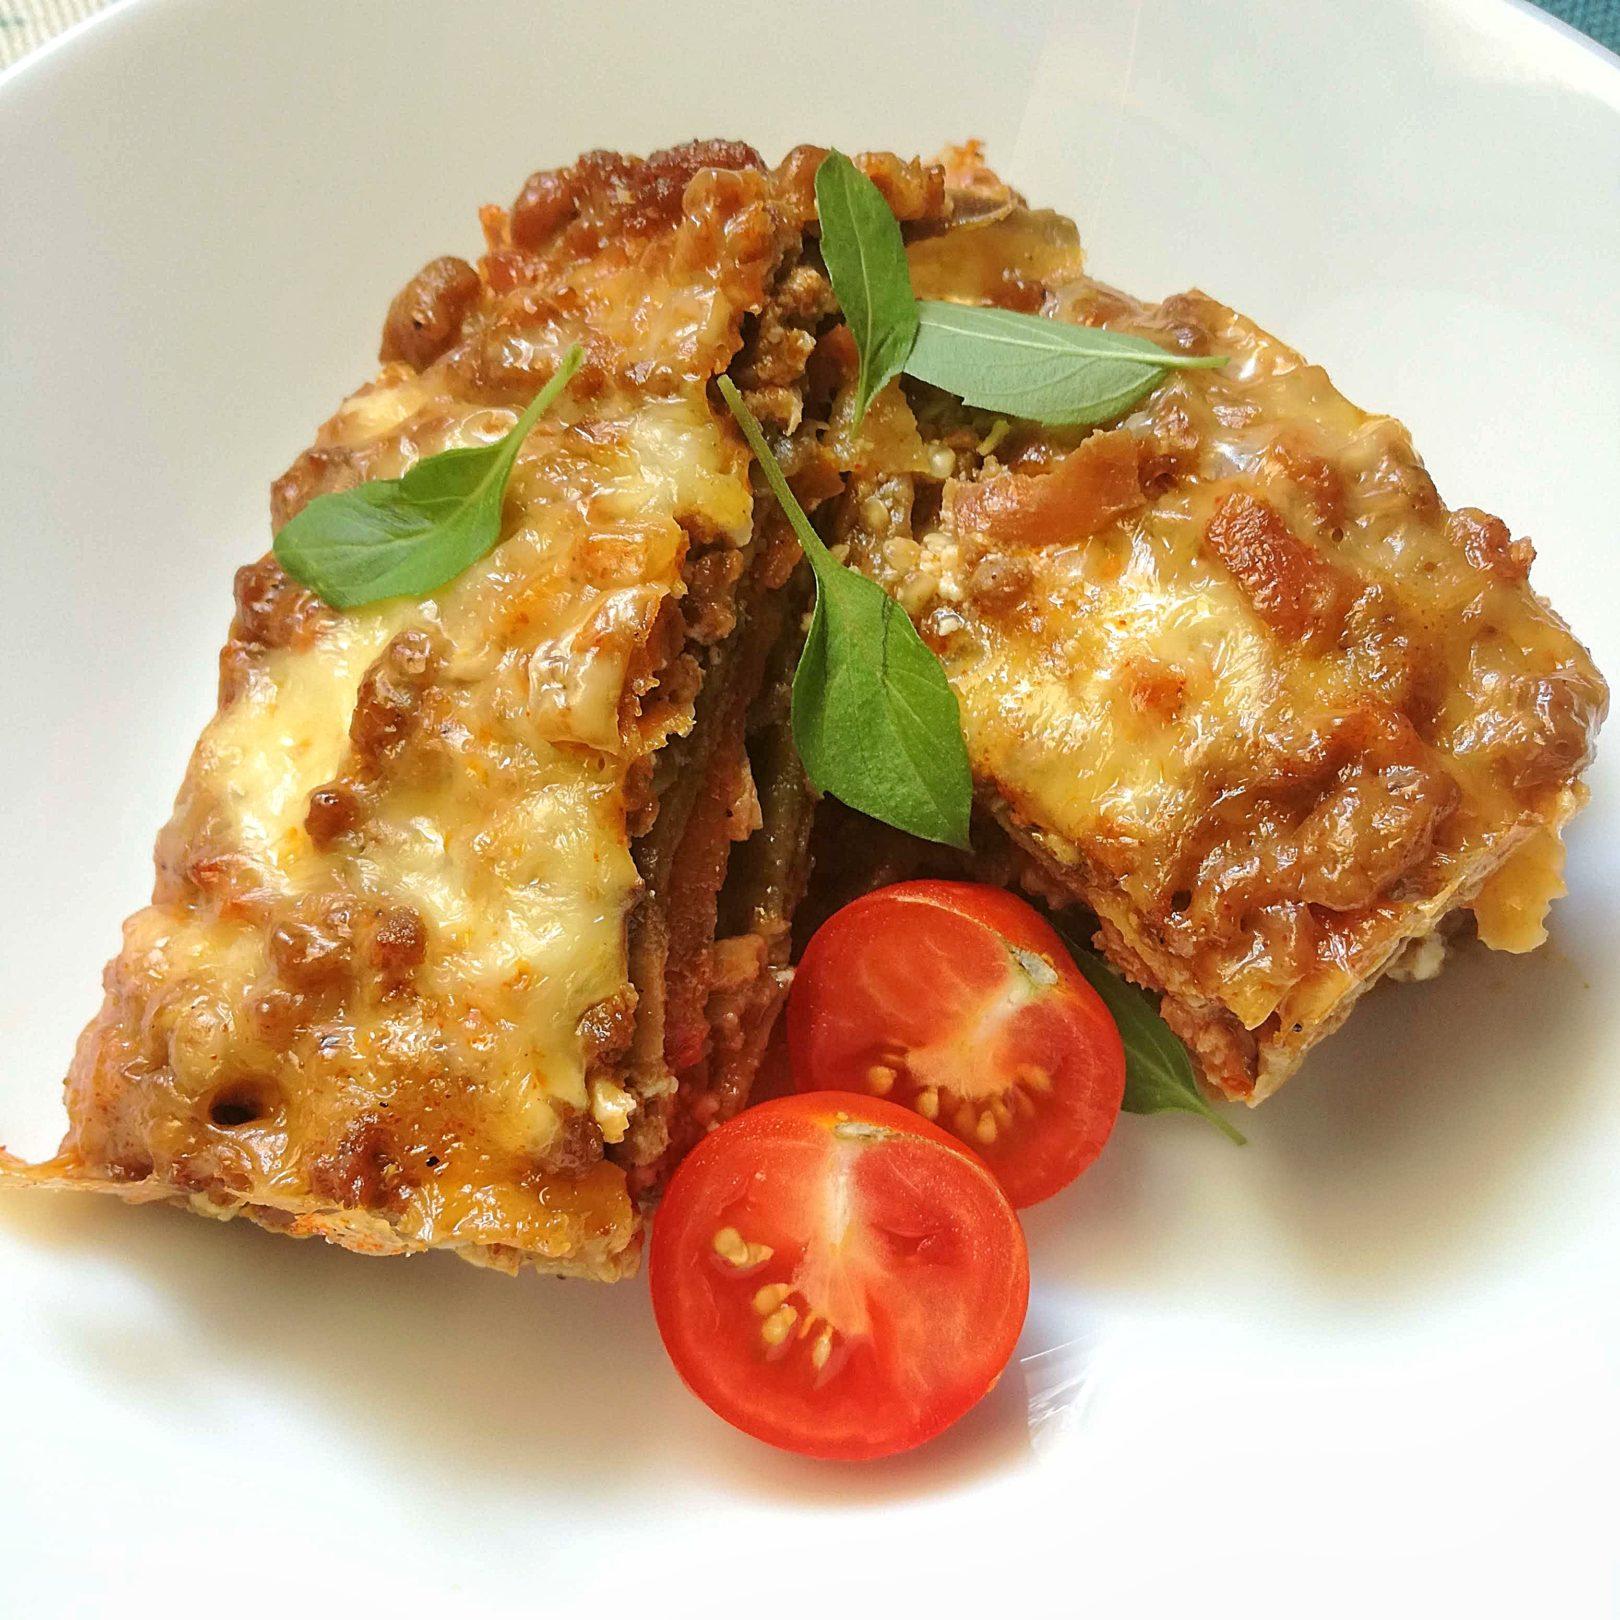 Low-Carb and Guilt-Free Eggplant Lasagna